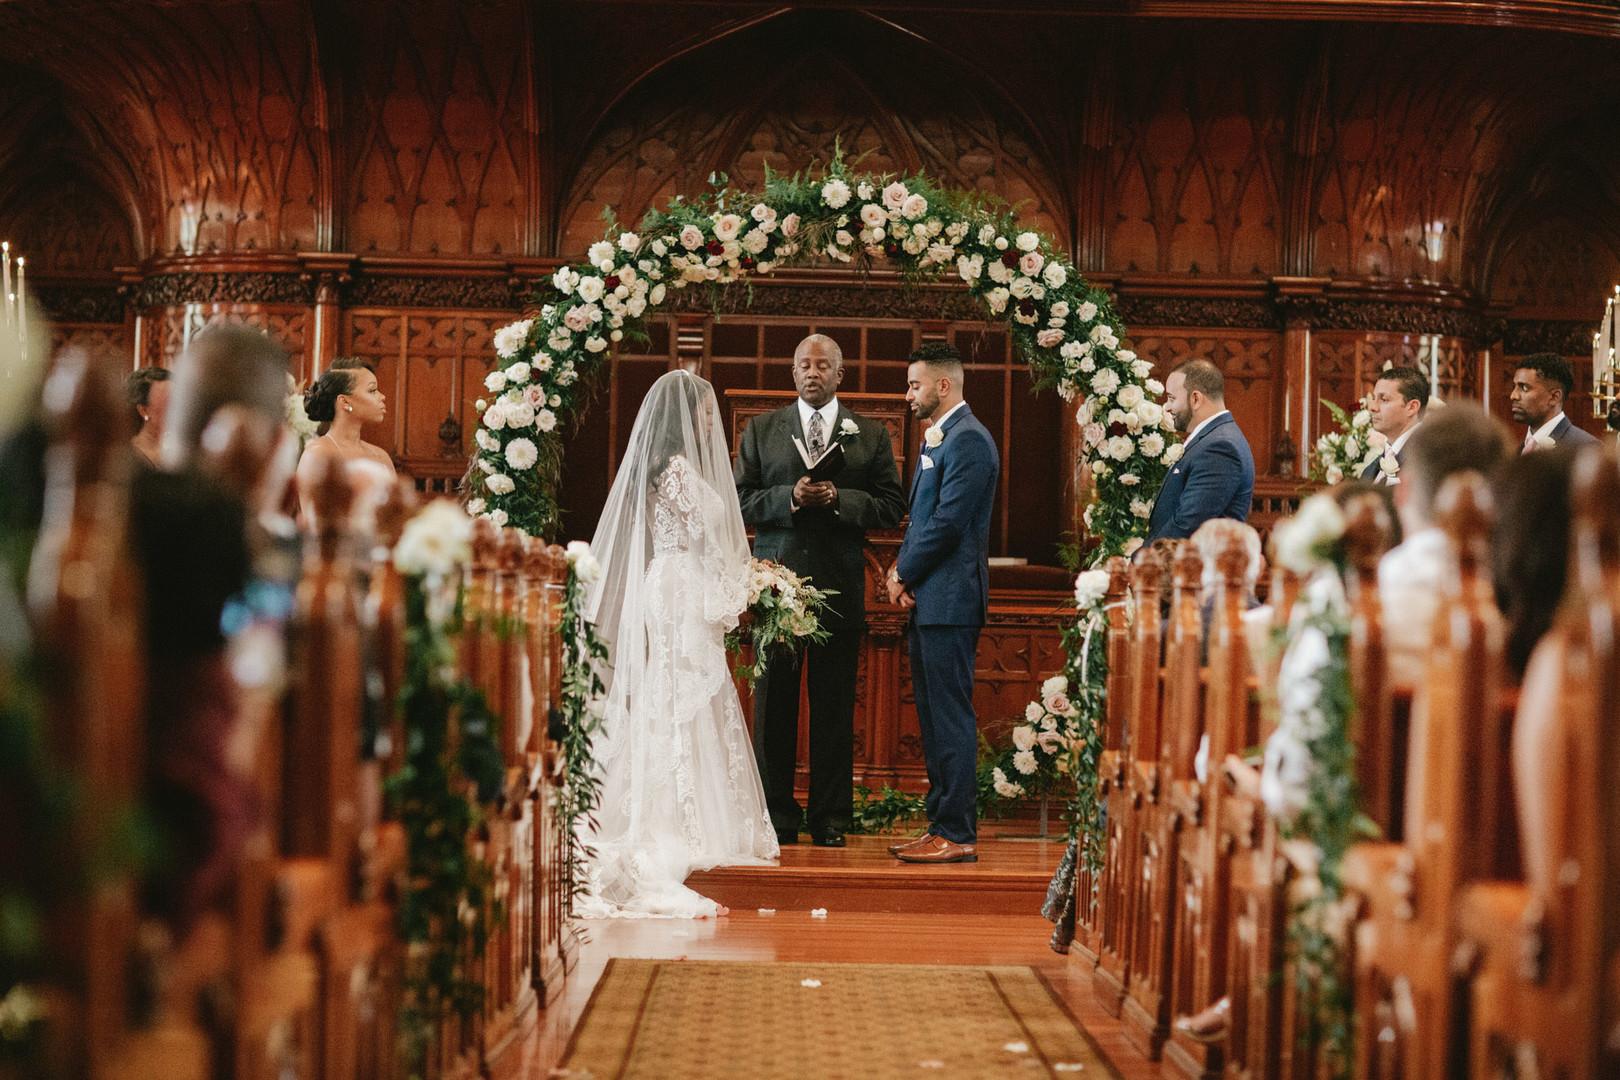 african american bride in church wedding ceremony